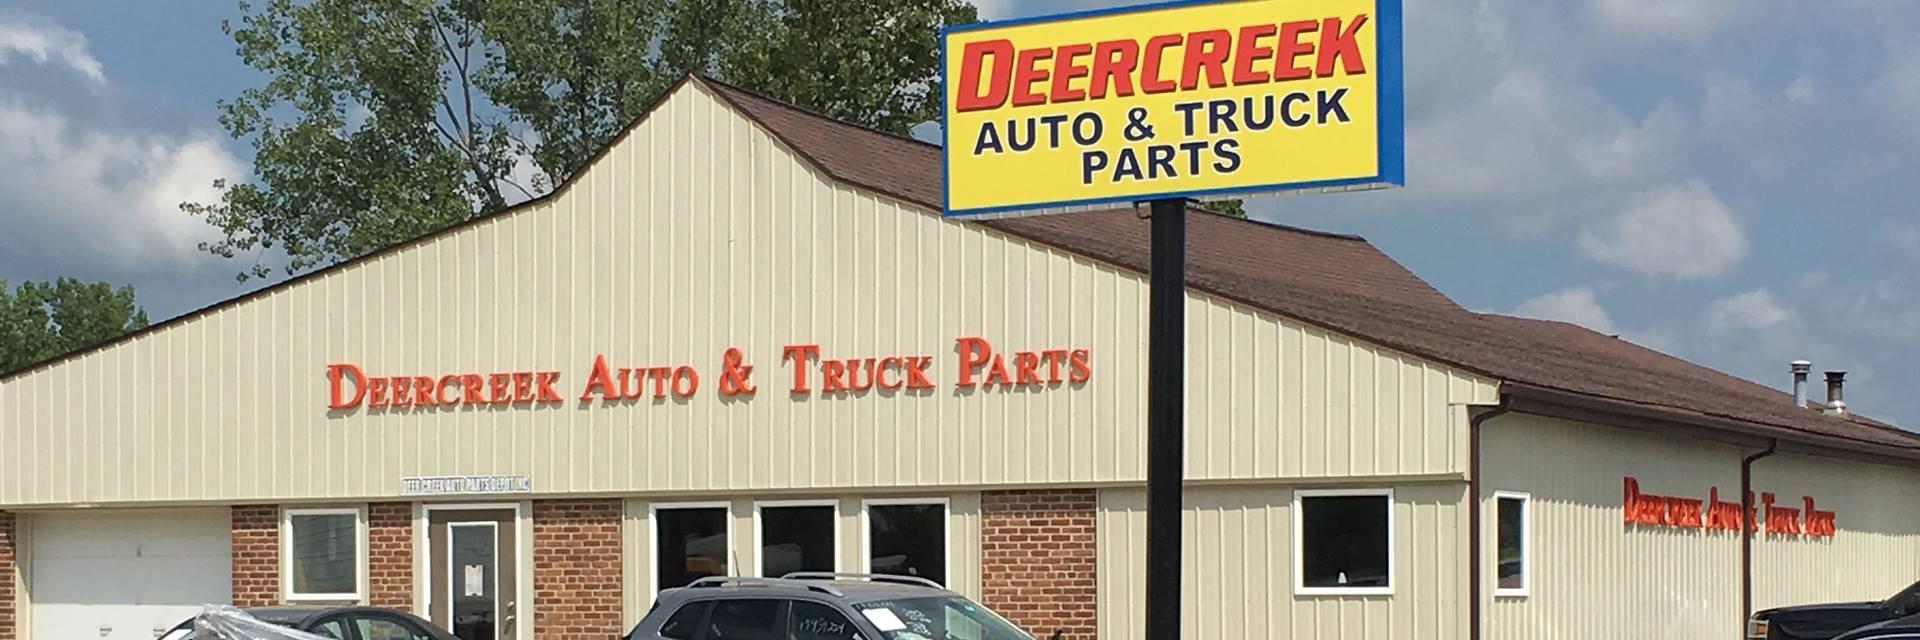 Deercreek Auto & Truck Parts